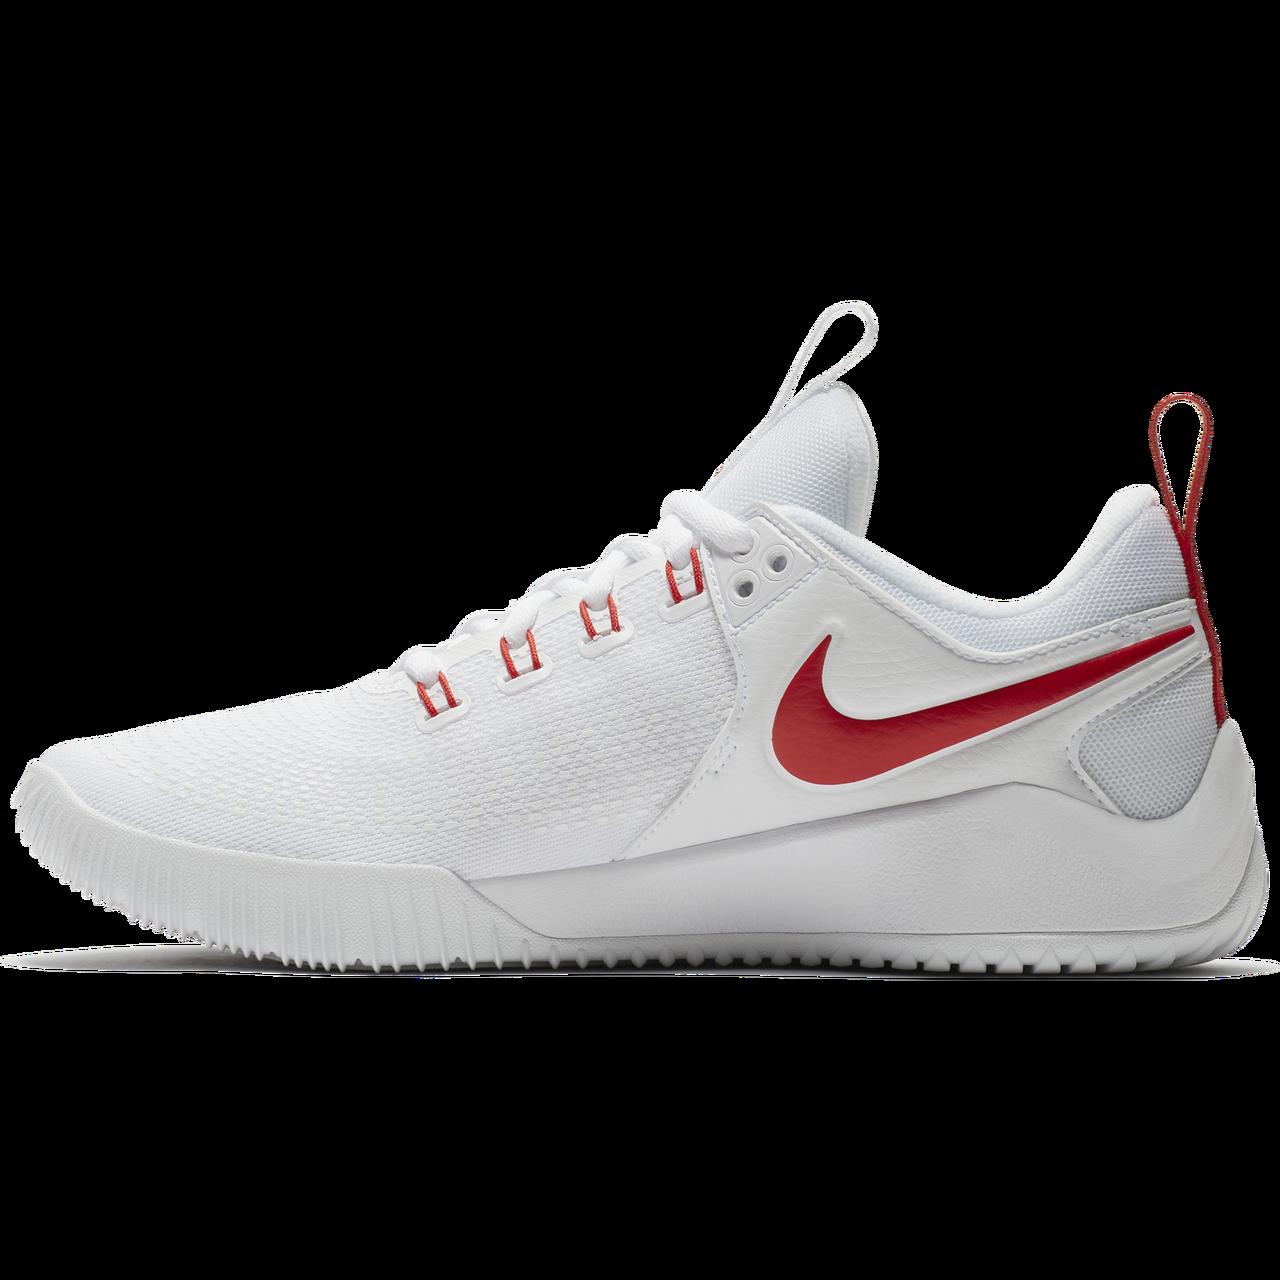 68bb8e2c8af55 Nike Men s Zoom HyperAce 2 - White University Red